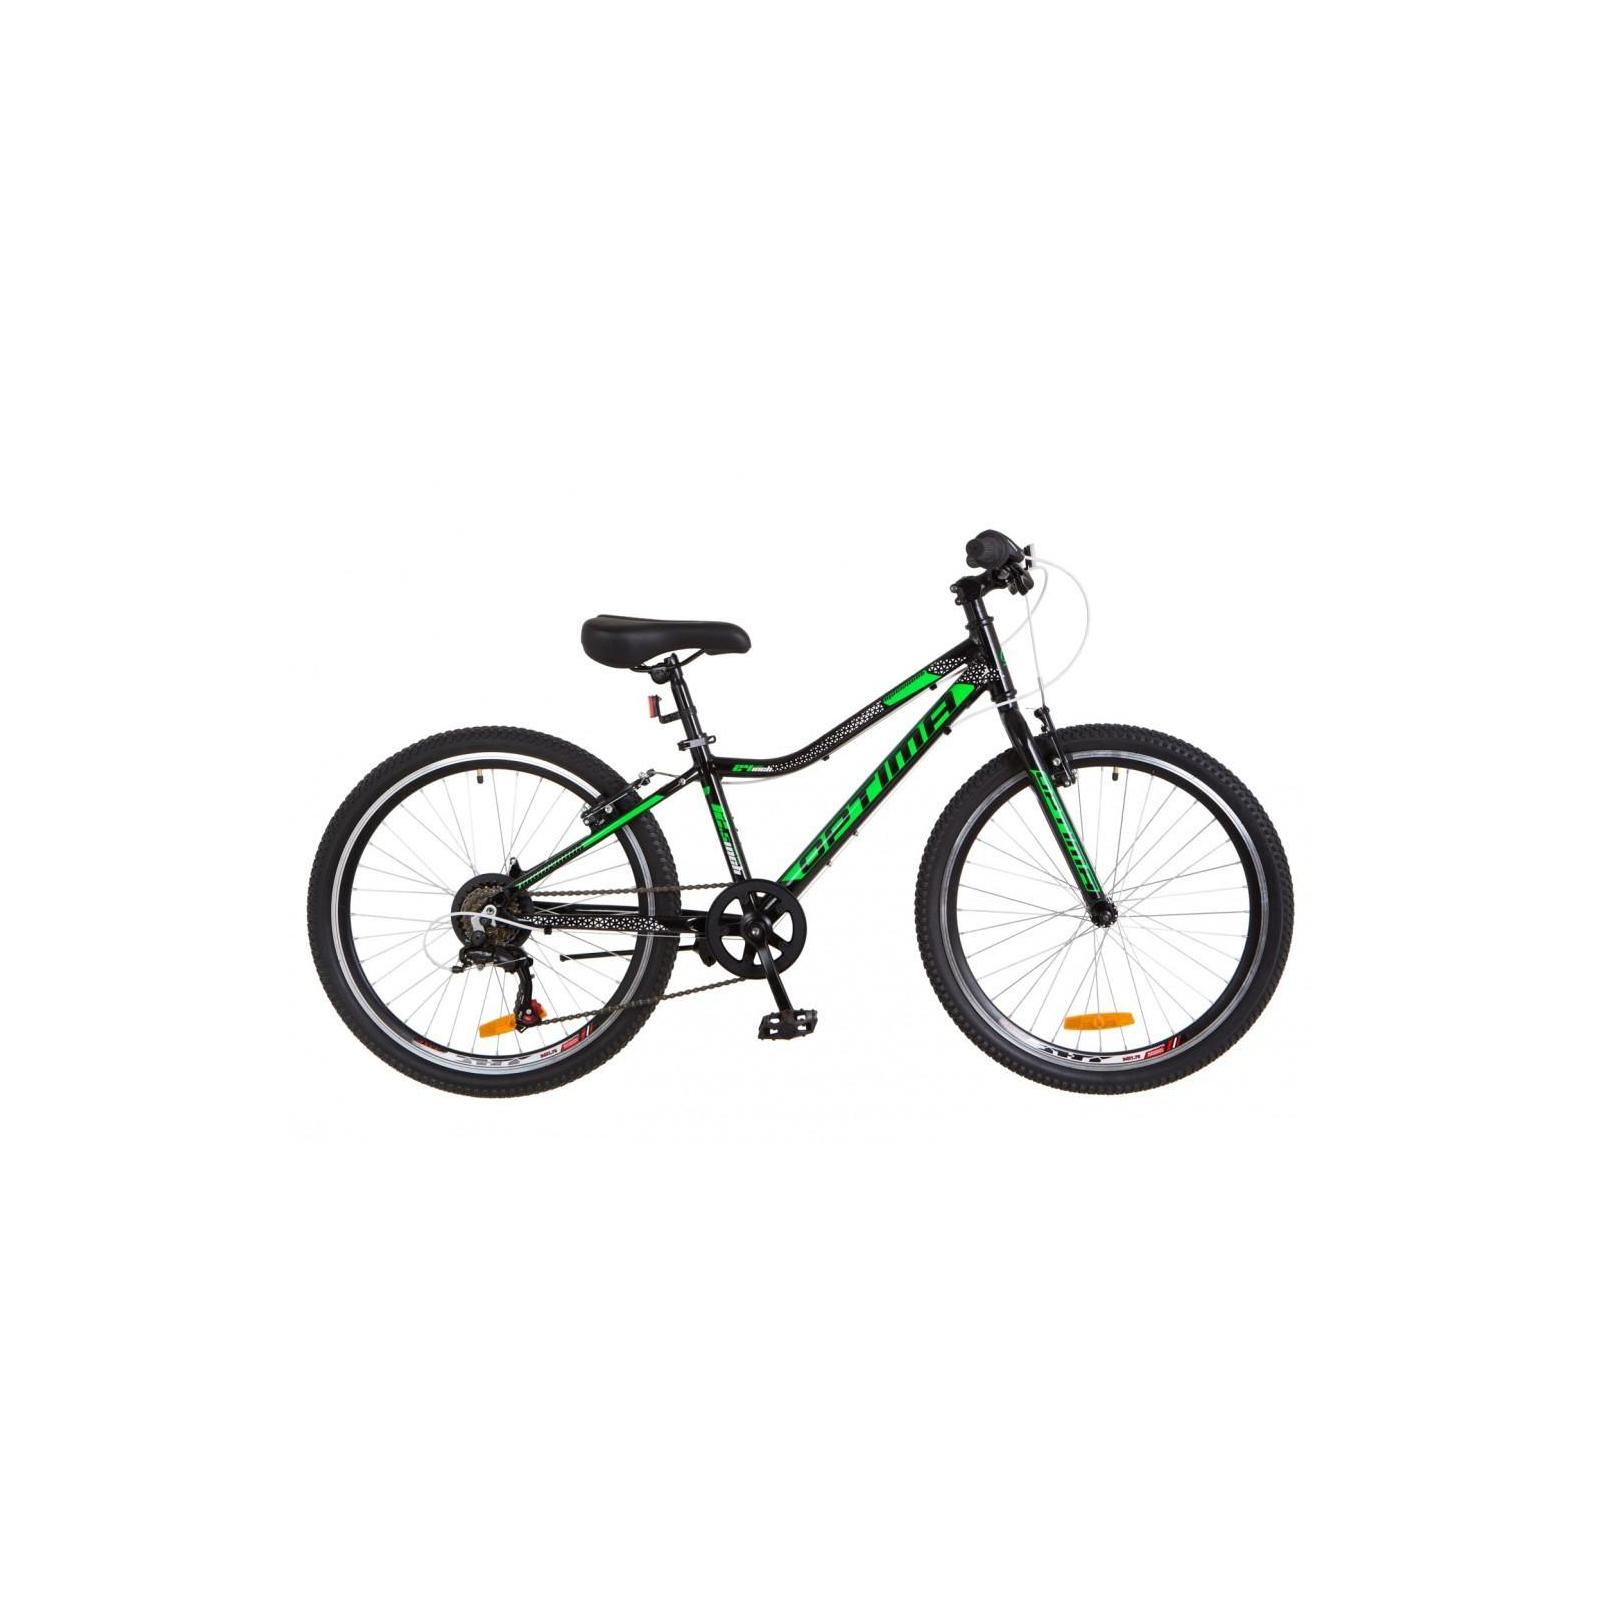 "Велосипед Optimabikes 24"" BLACKWOOD 2018 14G Vbr рама-12,5"" Al черно-зеленый (OPS-OP-24-028)"